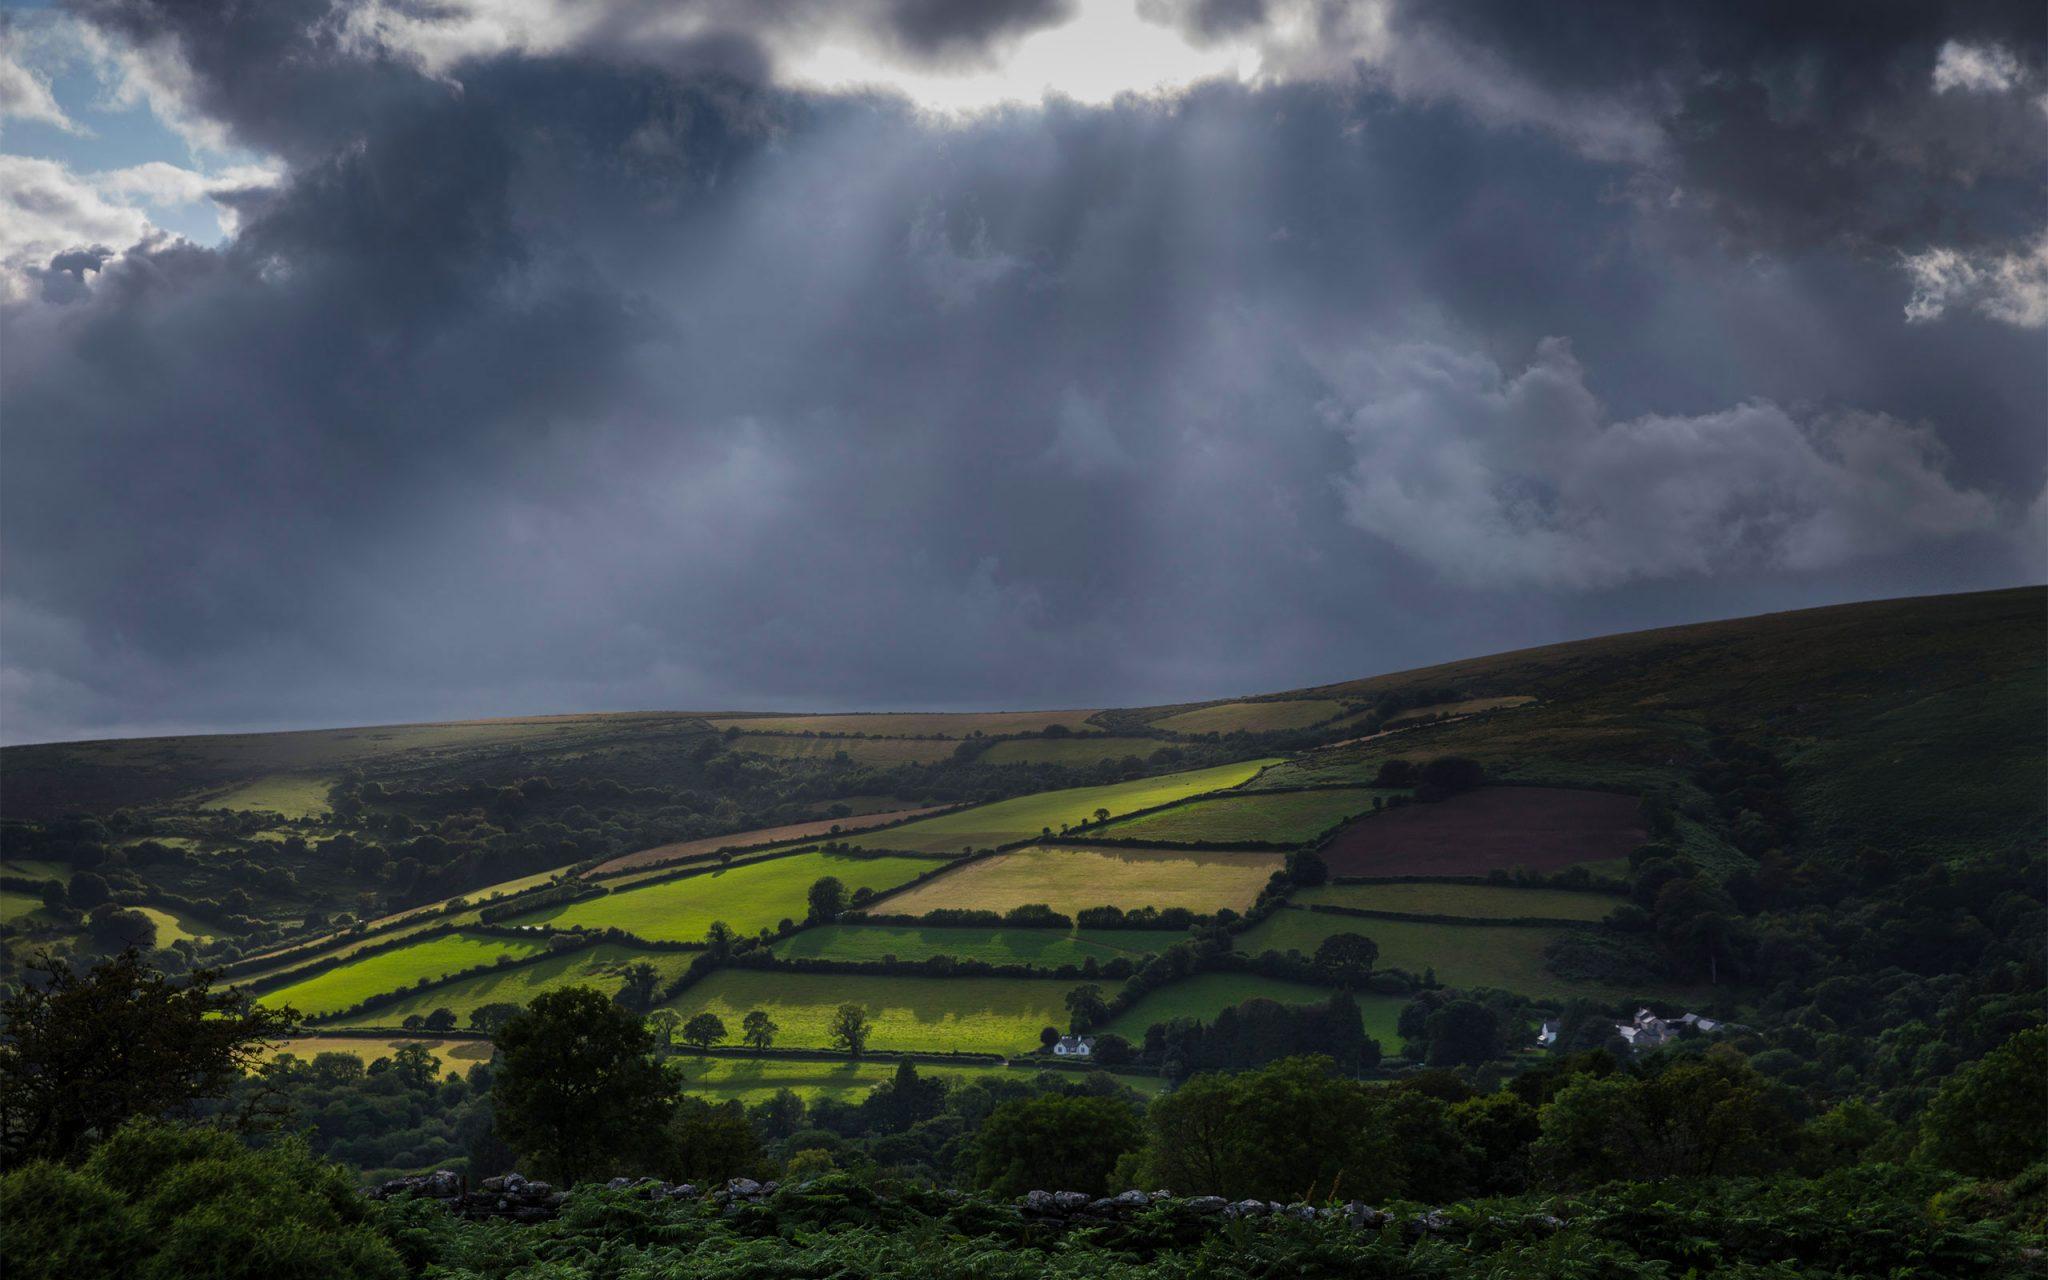 Carey Marks Photography, Documentary Photography, nature, Papillon Gin, environmental science, Landscape, Dartmoor, Rainstorm, Vista, Panorama, Landscape photography,